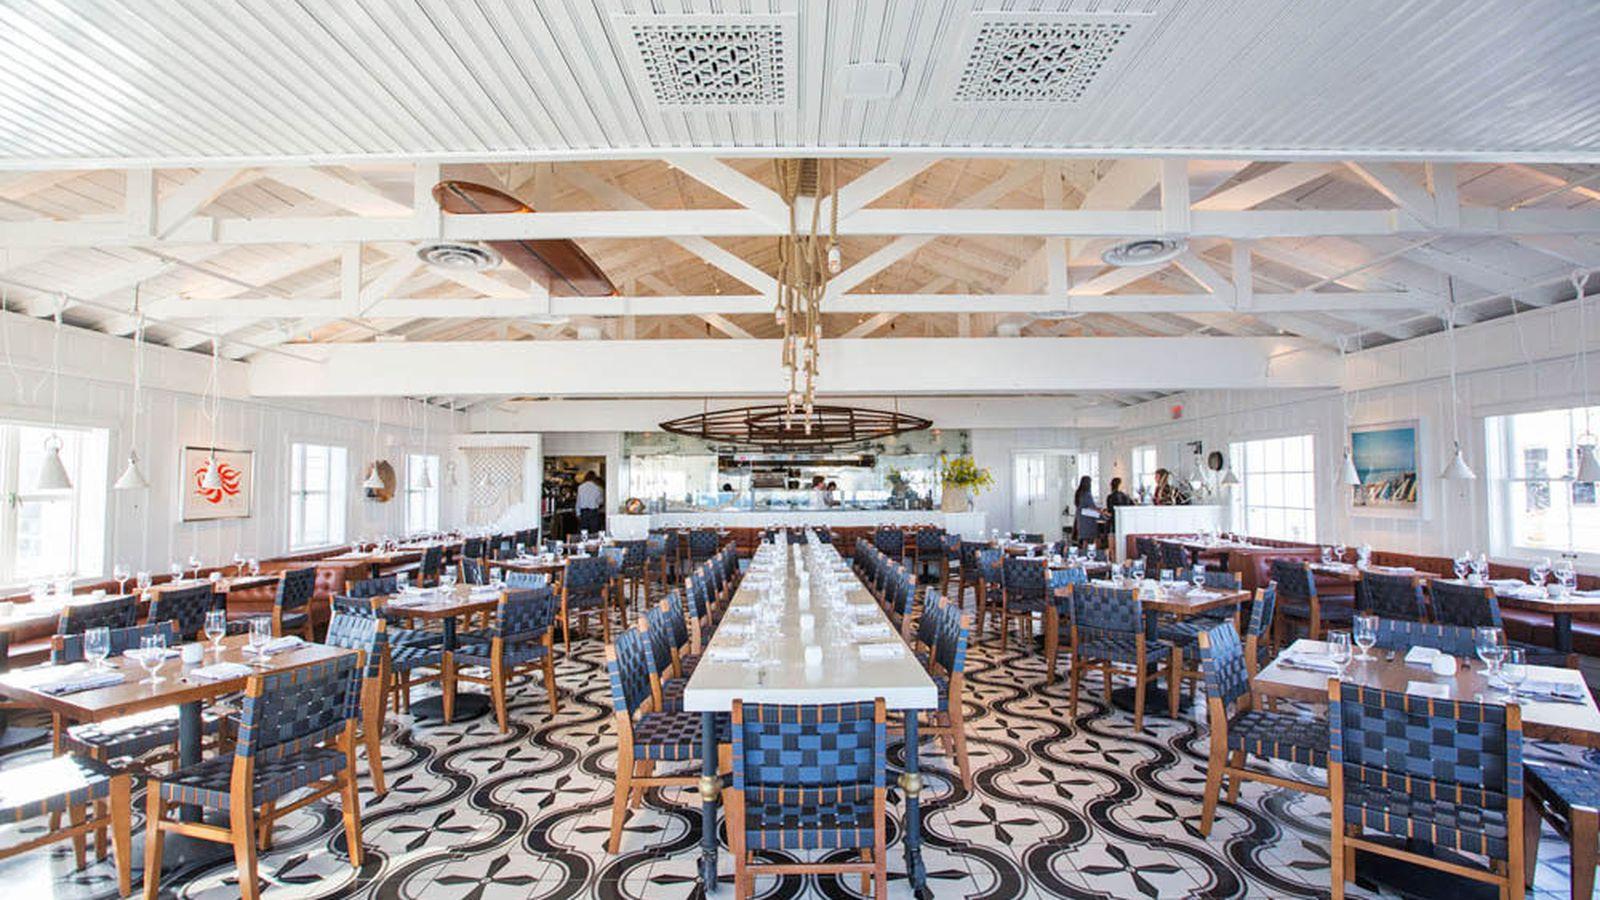 Malibu Farm Restaurant And Bar